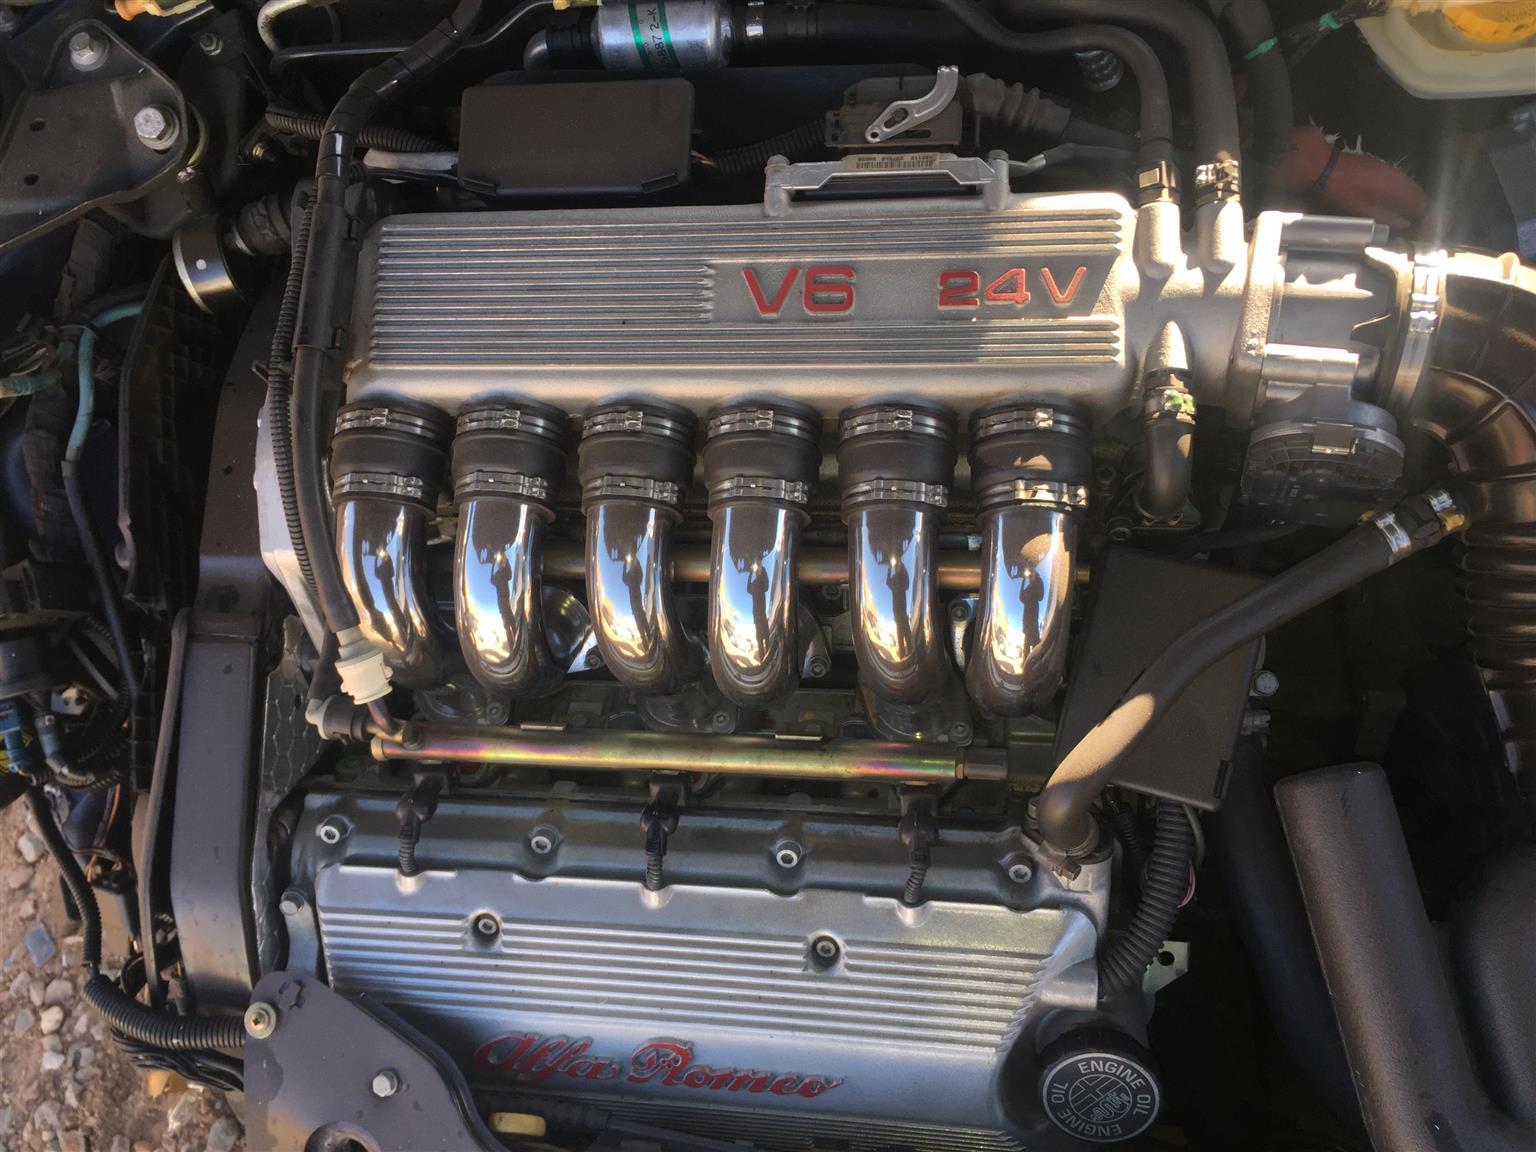 2008 Alfa Romeo Gt 3 2 V6 Distinctive Junk Mail